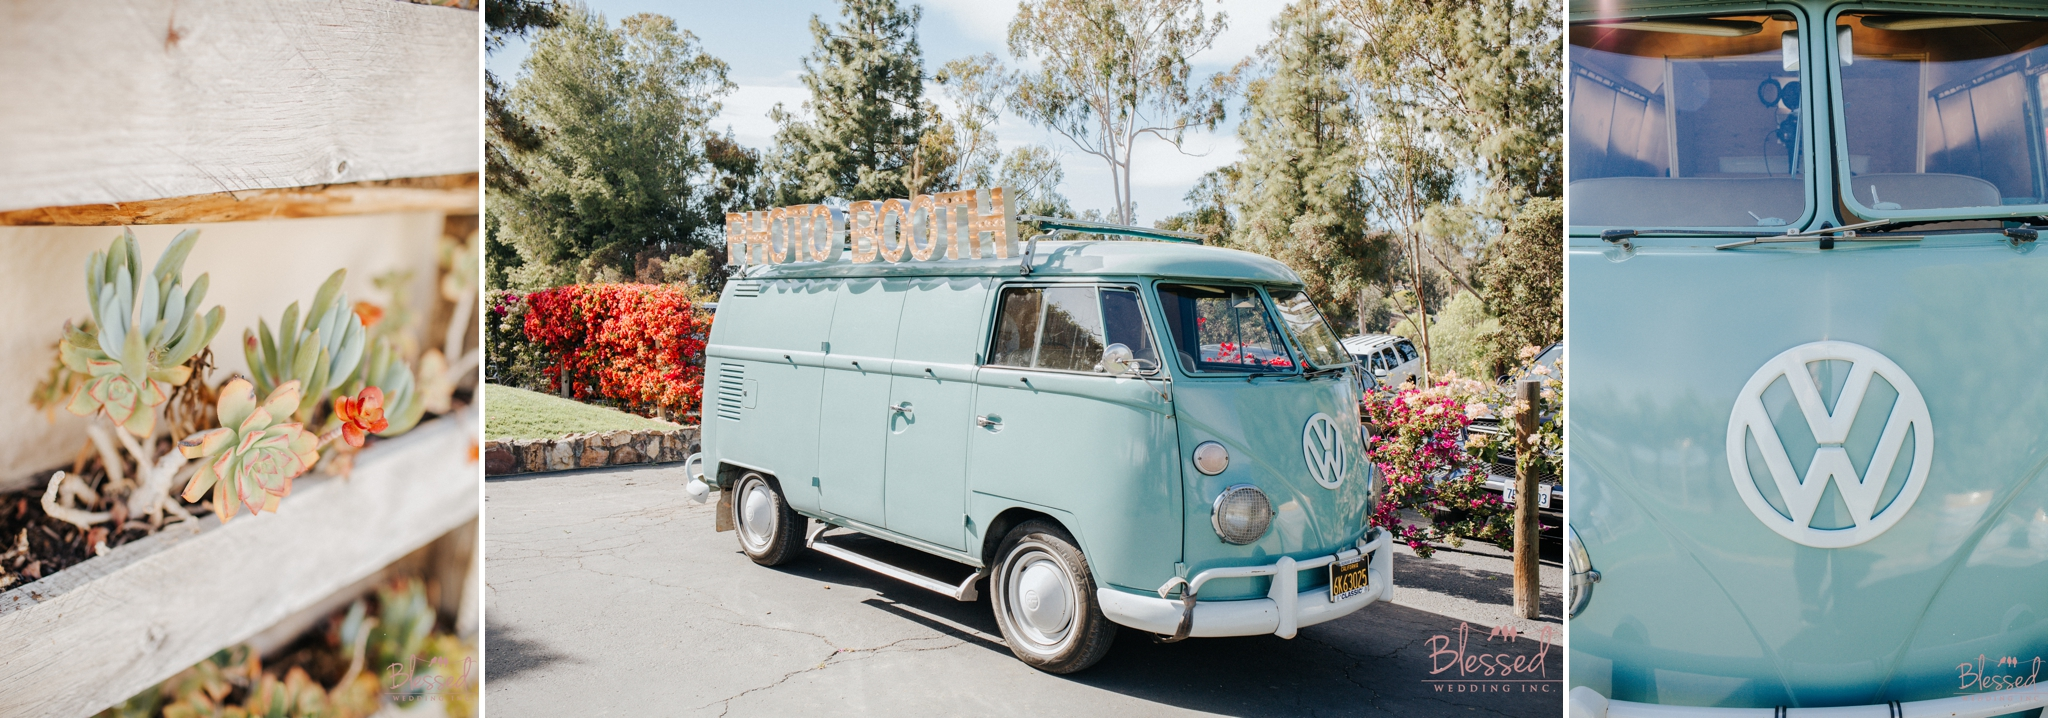 Orfila Vinery Wedding by Blessed Wedding Photography 42.jpg